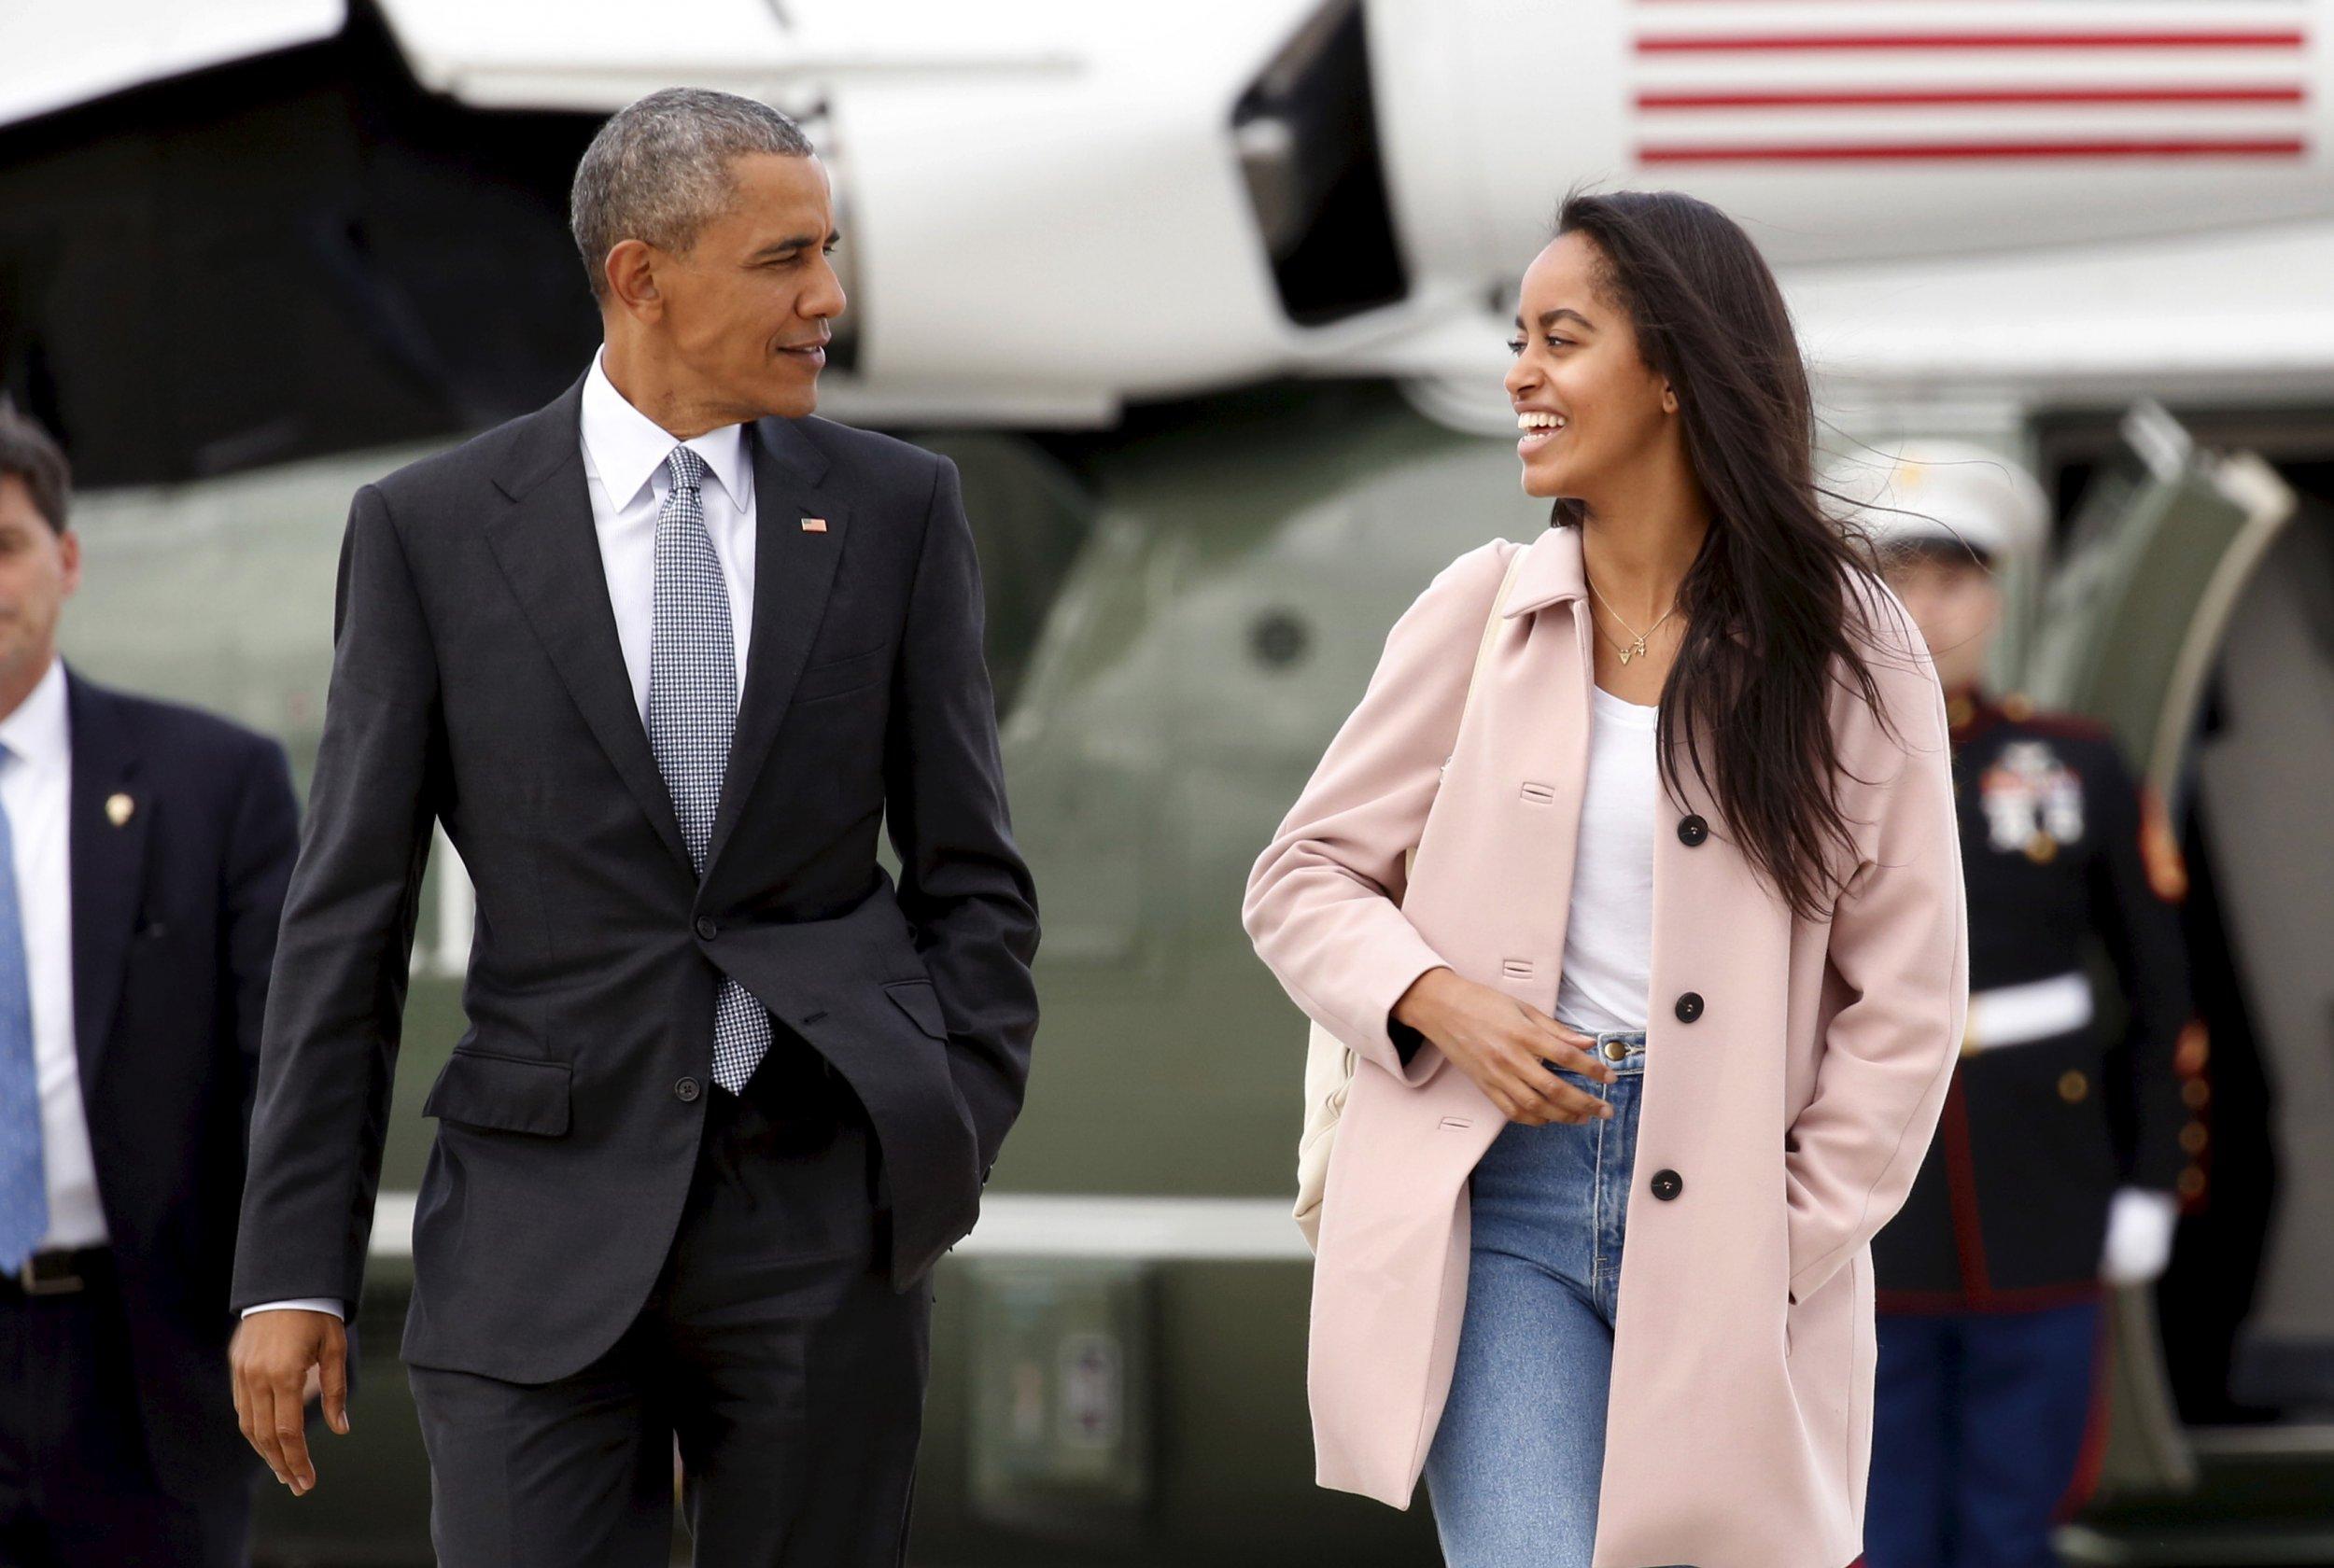 With Malia Obama And Tiffany Trump Starting School A Look